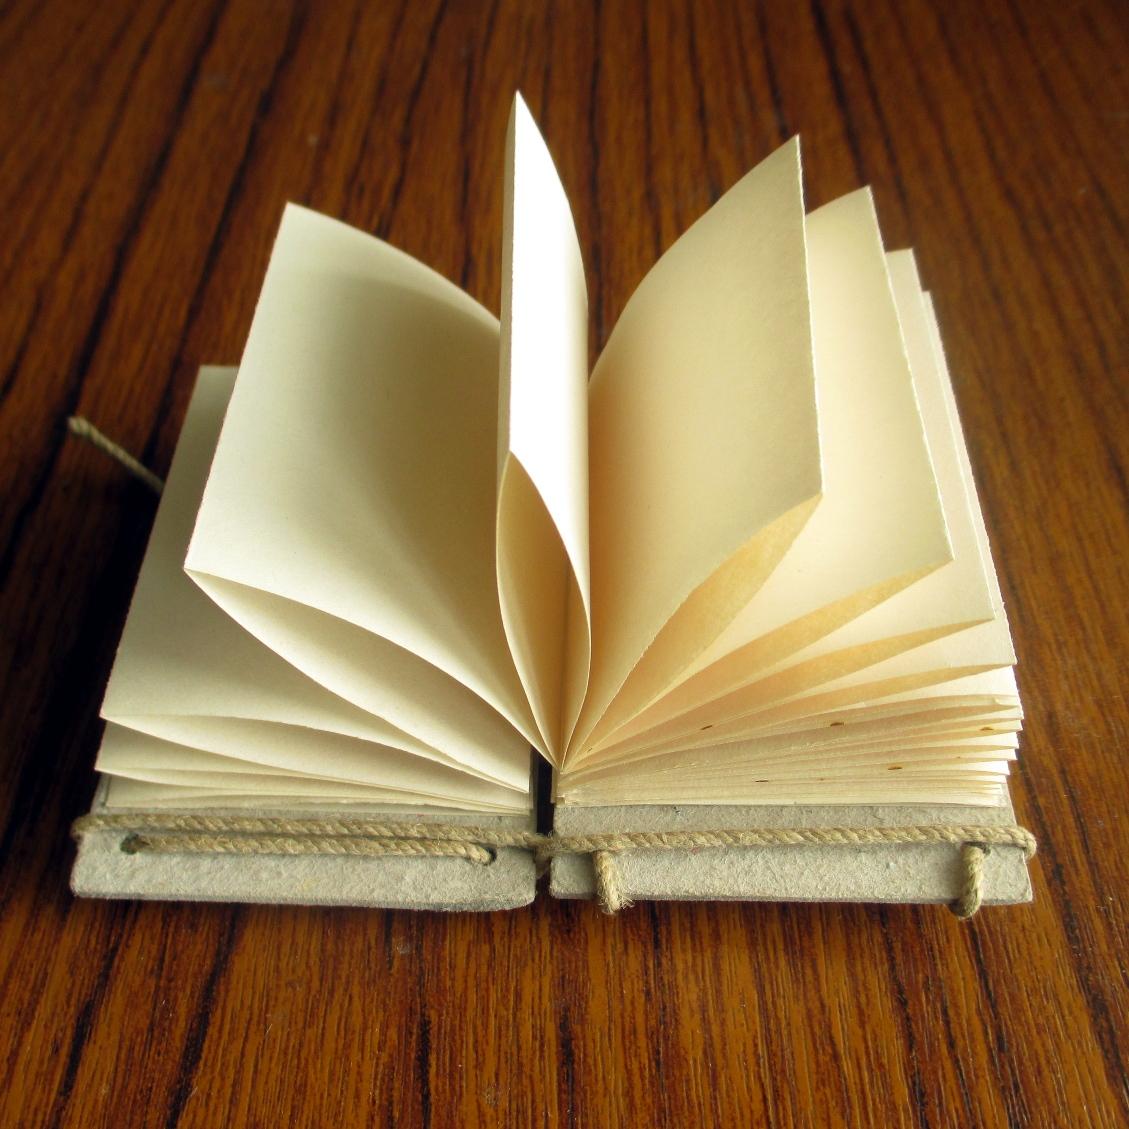 Srjskam: Accordion Book With Jacob's Ladder Binding